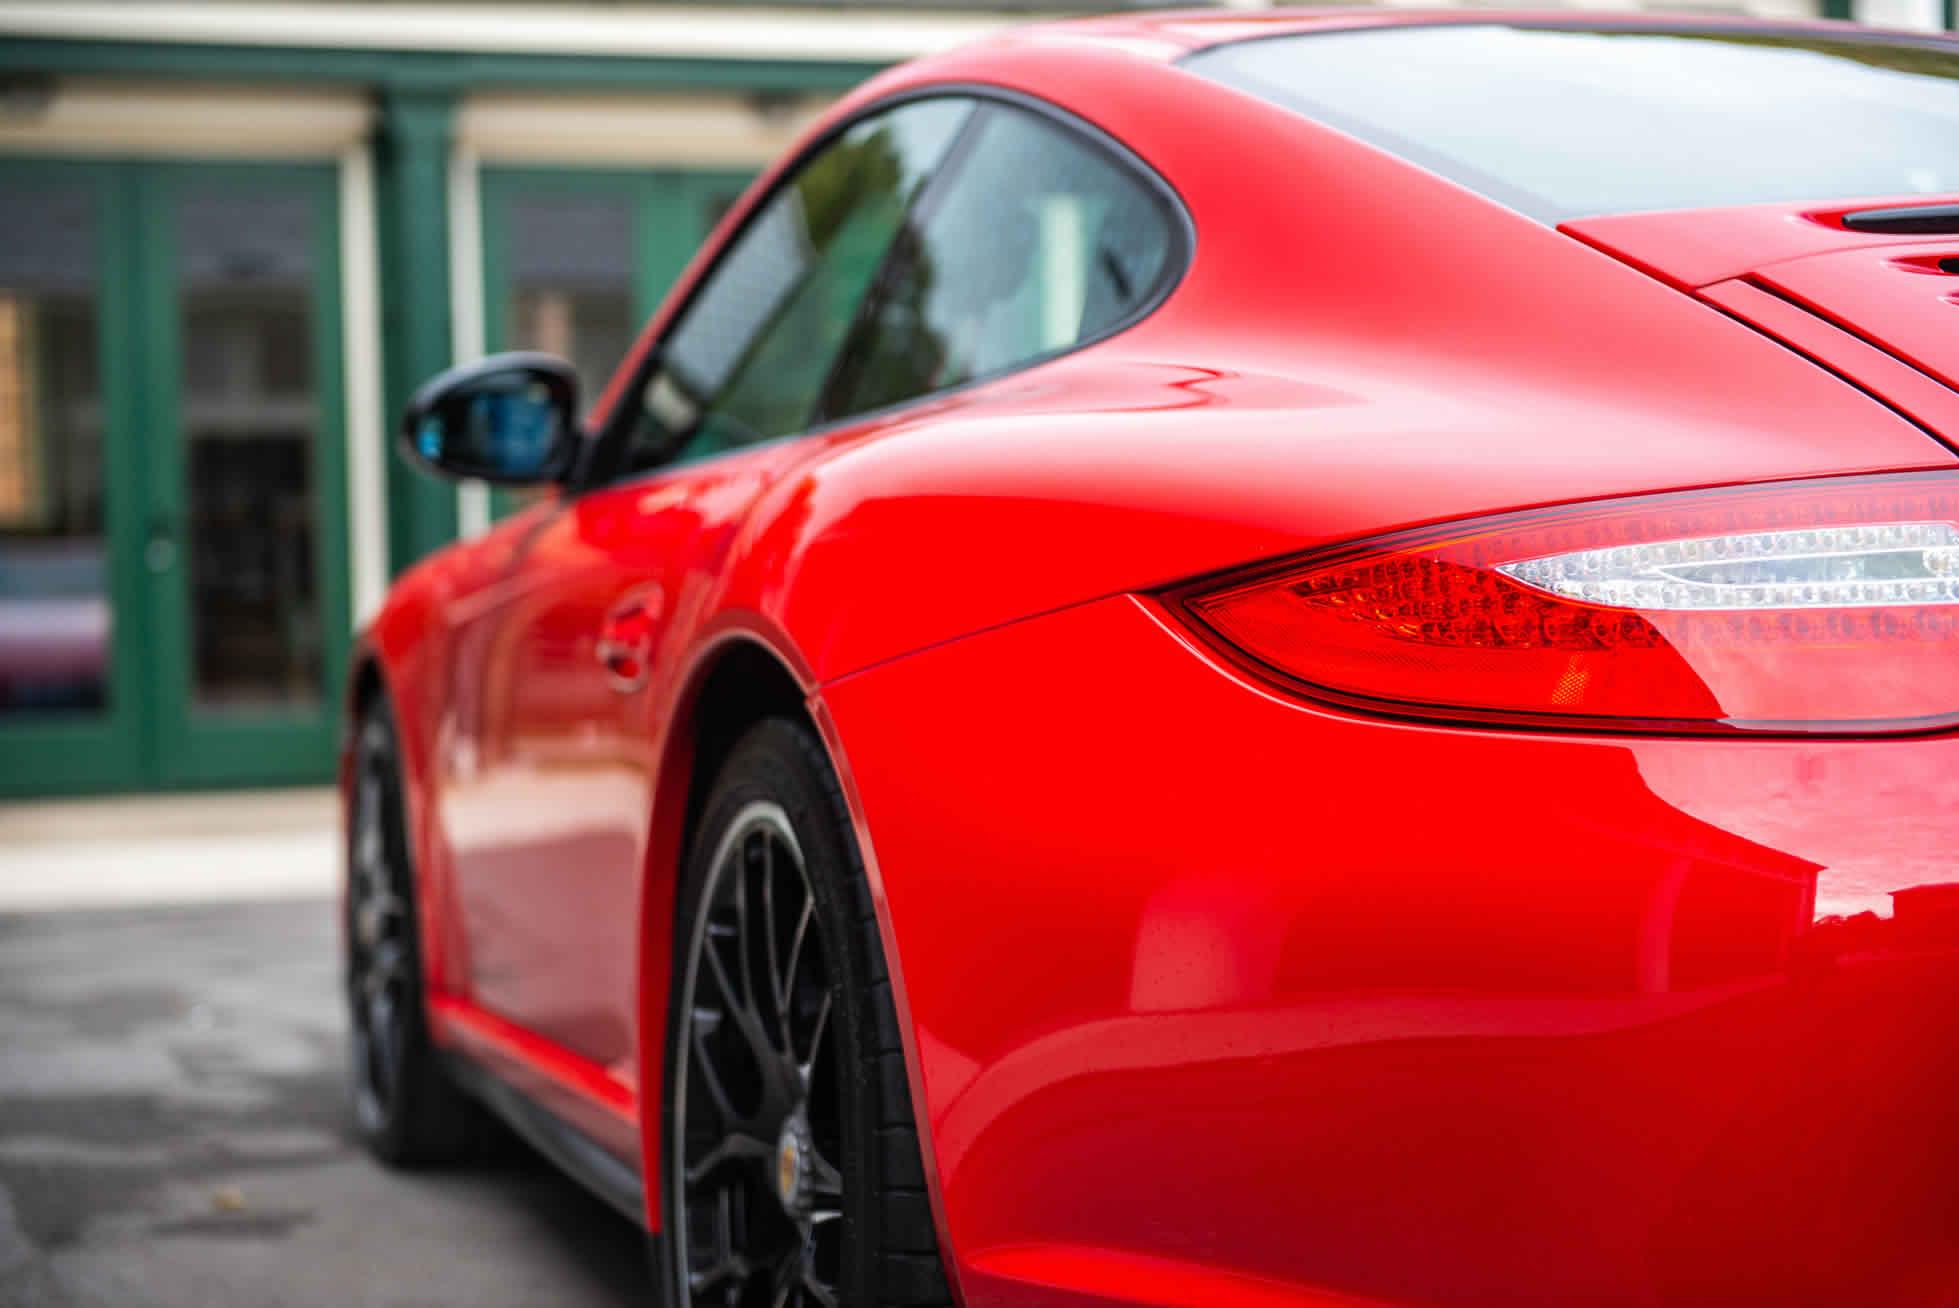 Rear quarter 2011 Porsche 911 Carrera GTS For Sale at Sports Purpose, Bicester Heriatge